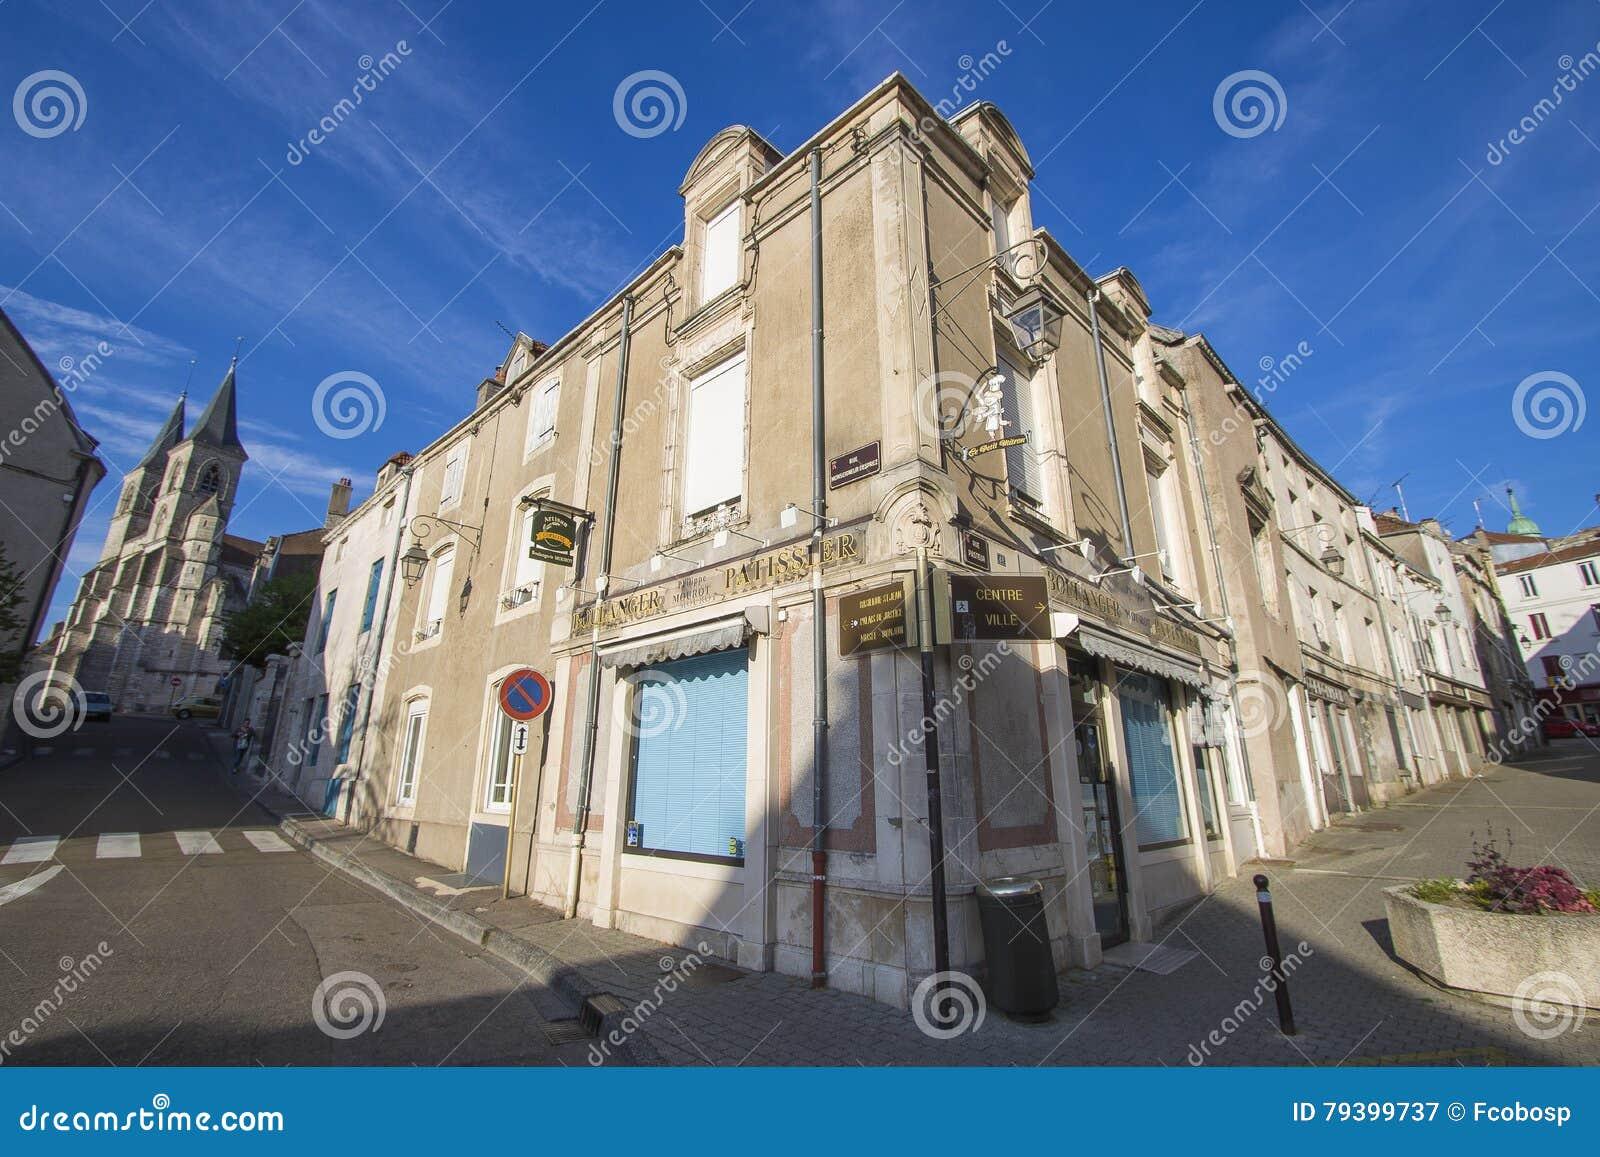 Chaumont, Marne, Francja